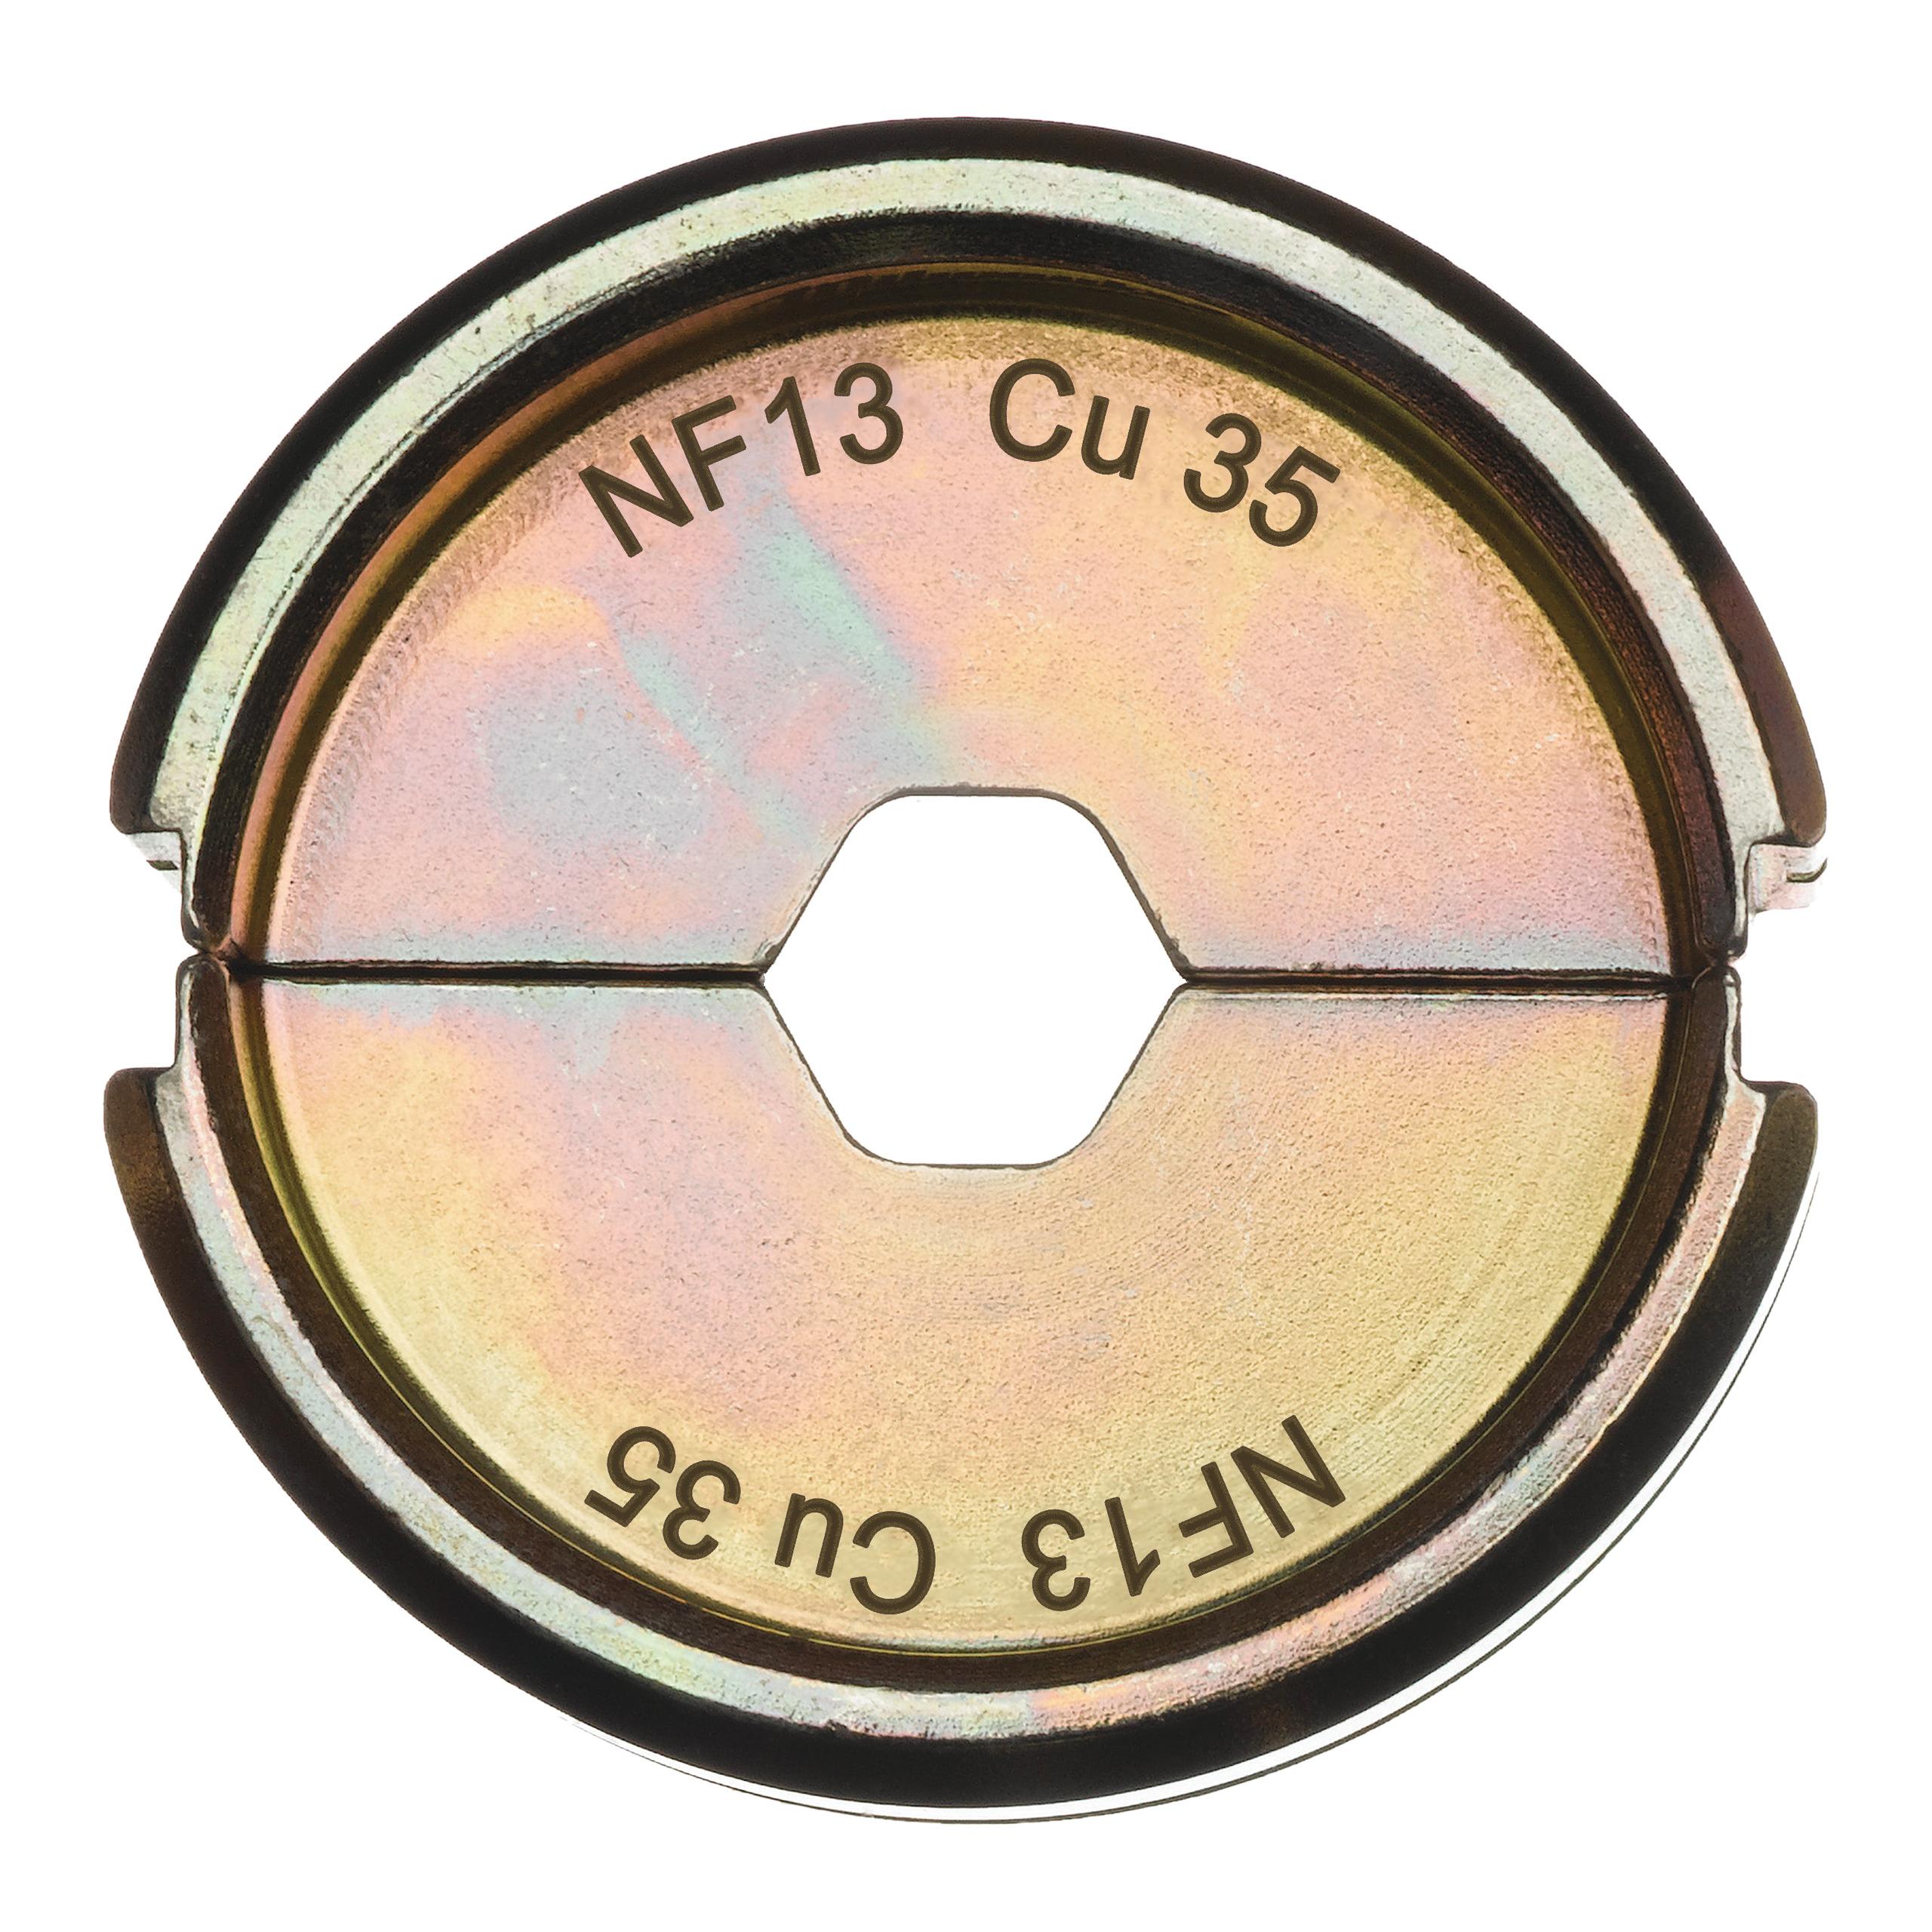 NF13 CU 35-1PC Pojistný kroužek